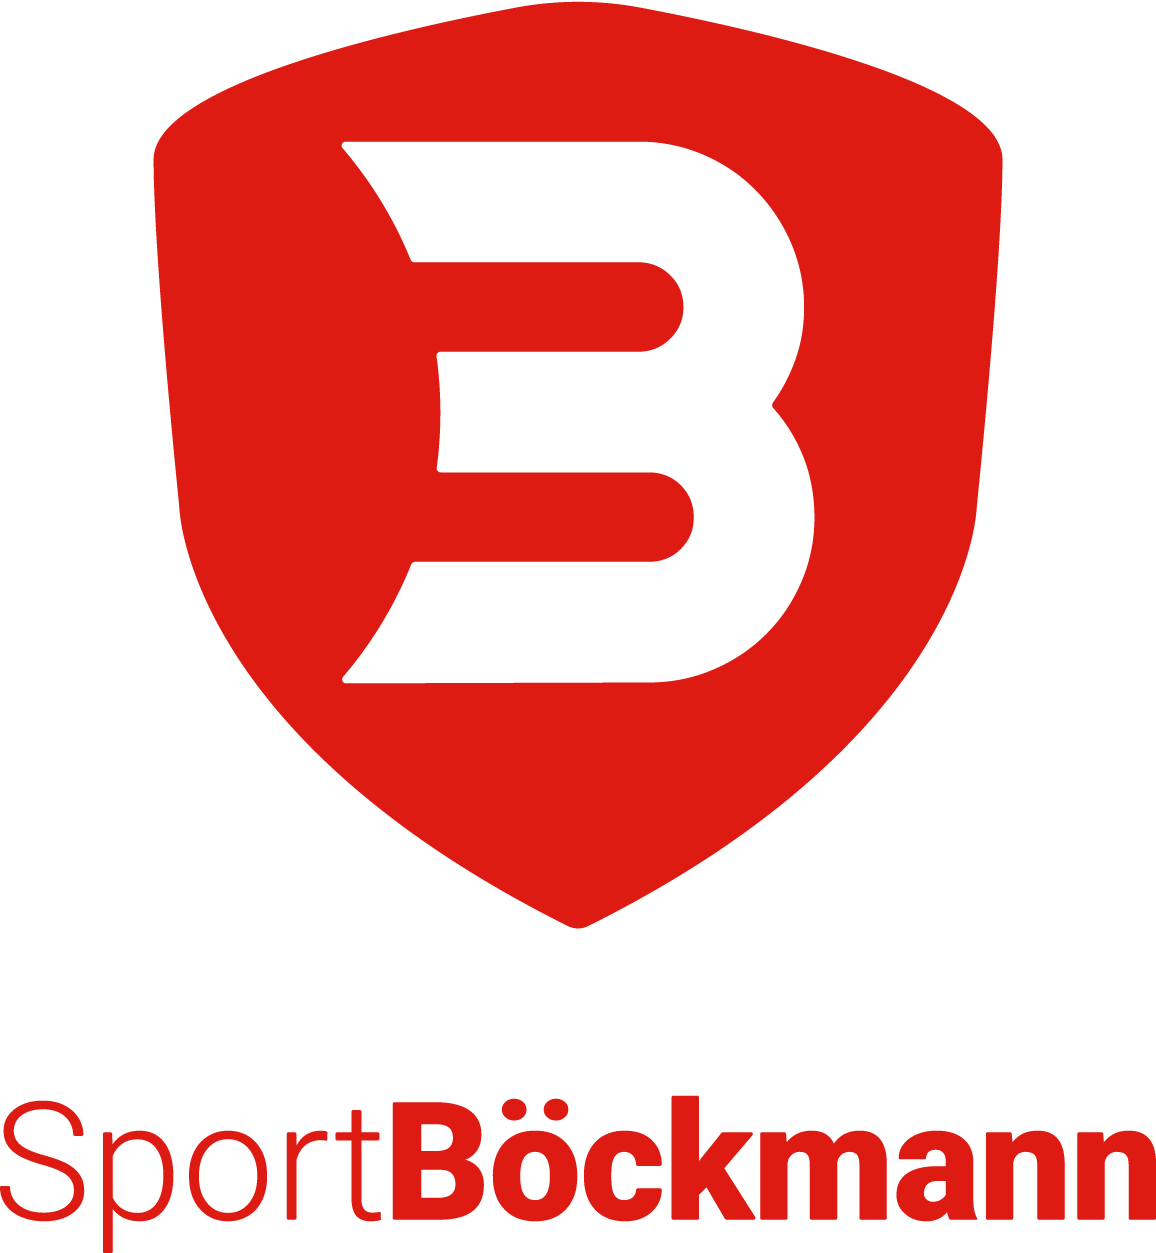 logo_red_thin_2